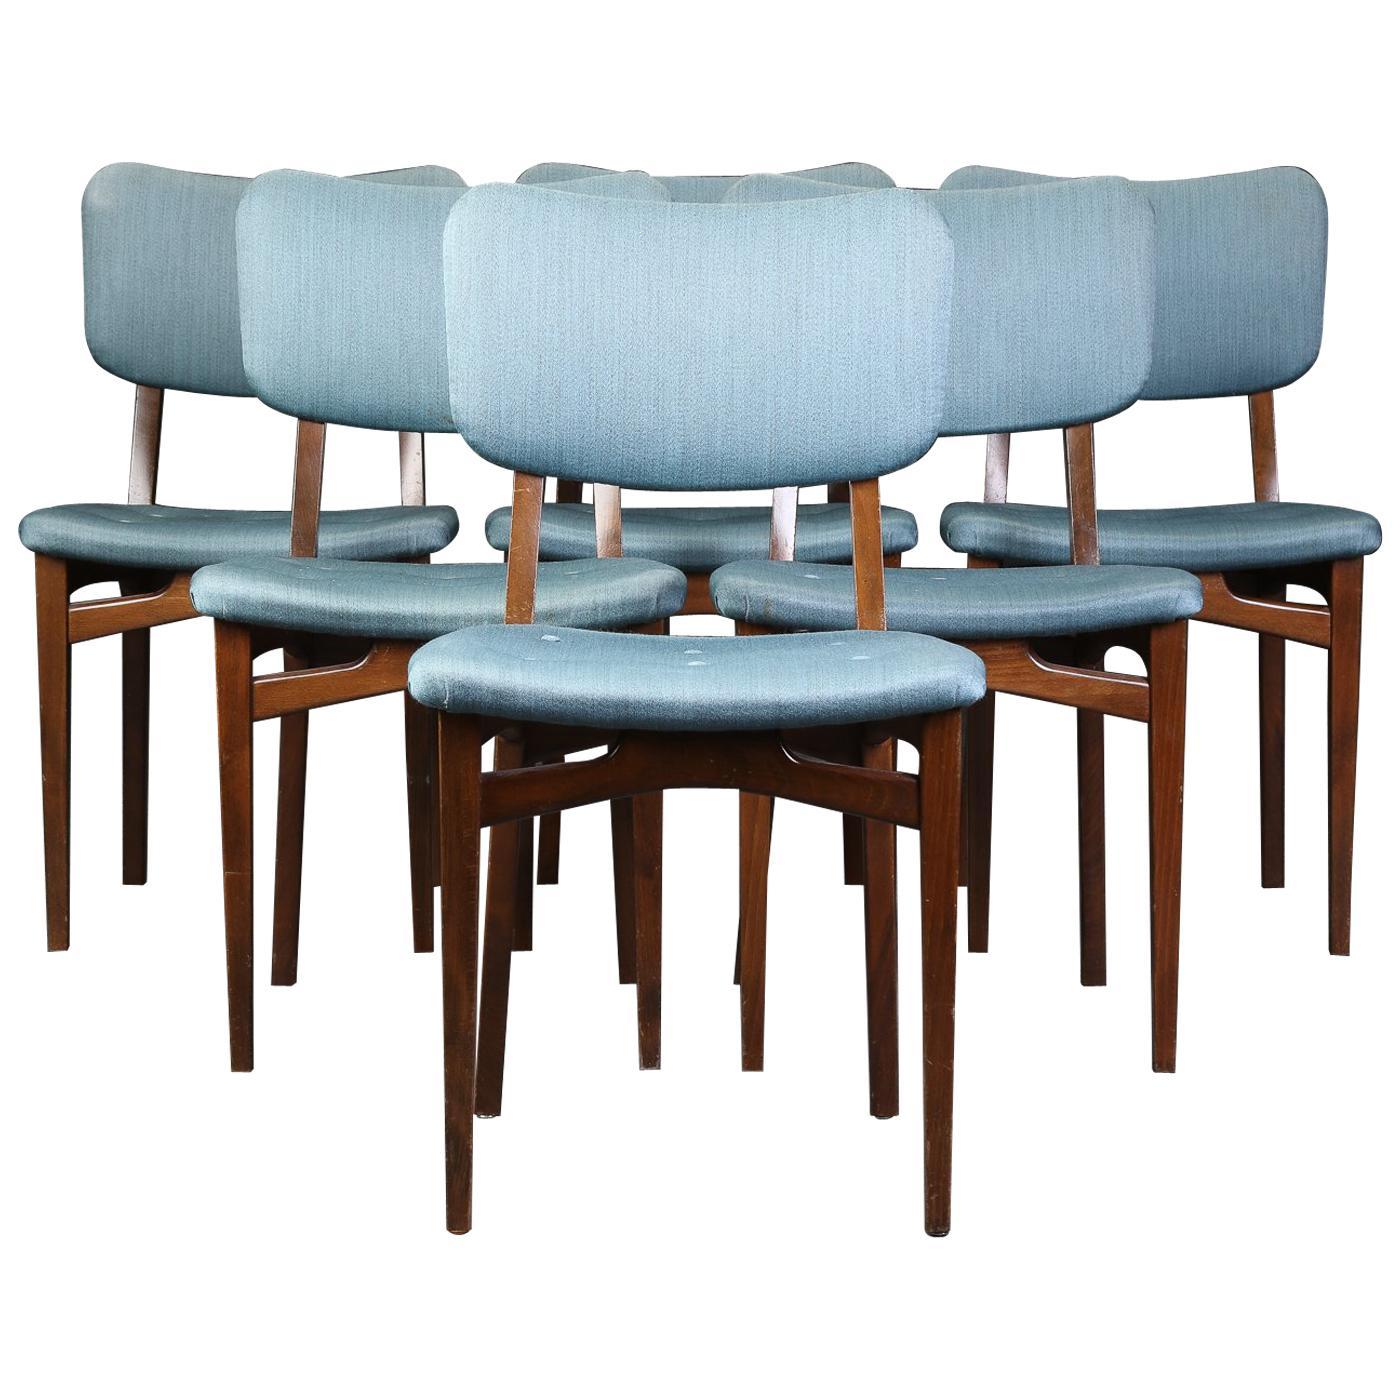 Set of Six Midcentury Danish Dining Chairs